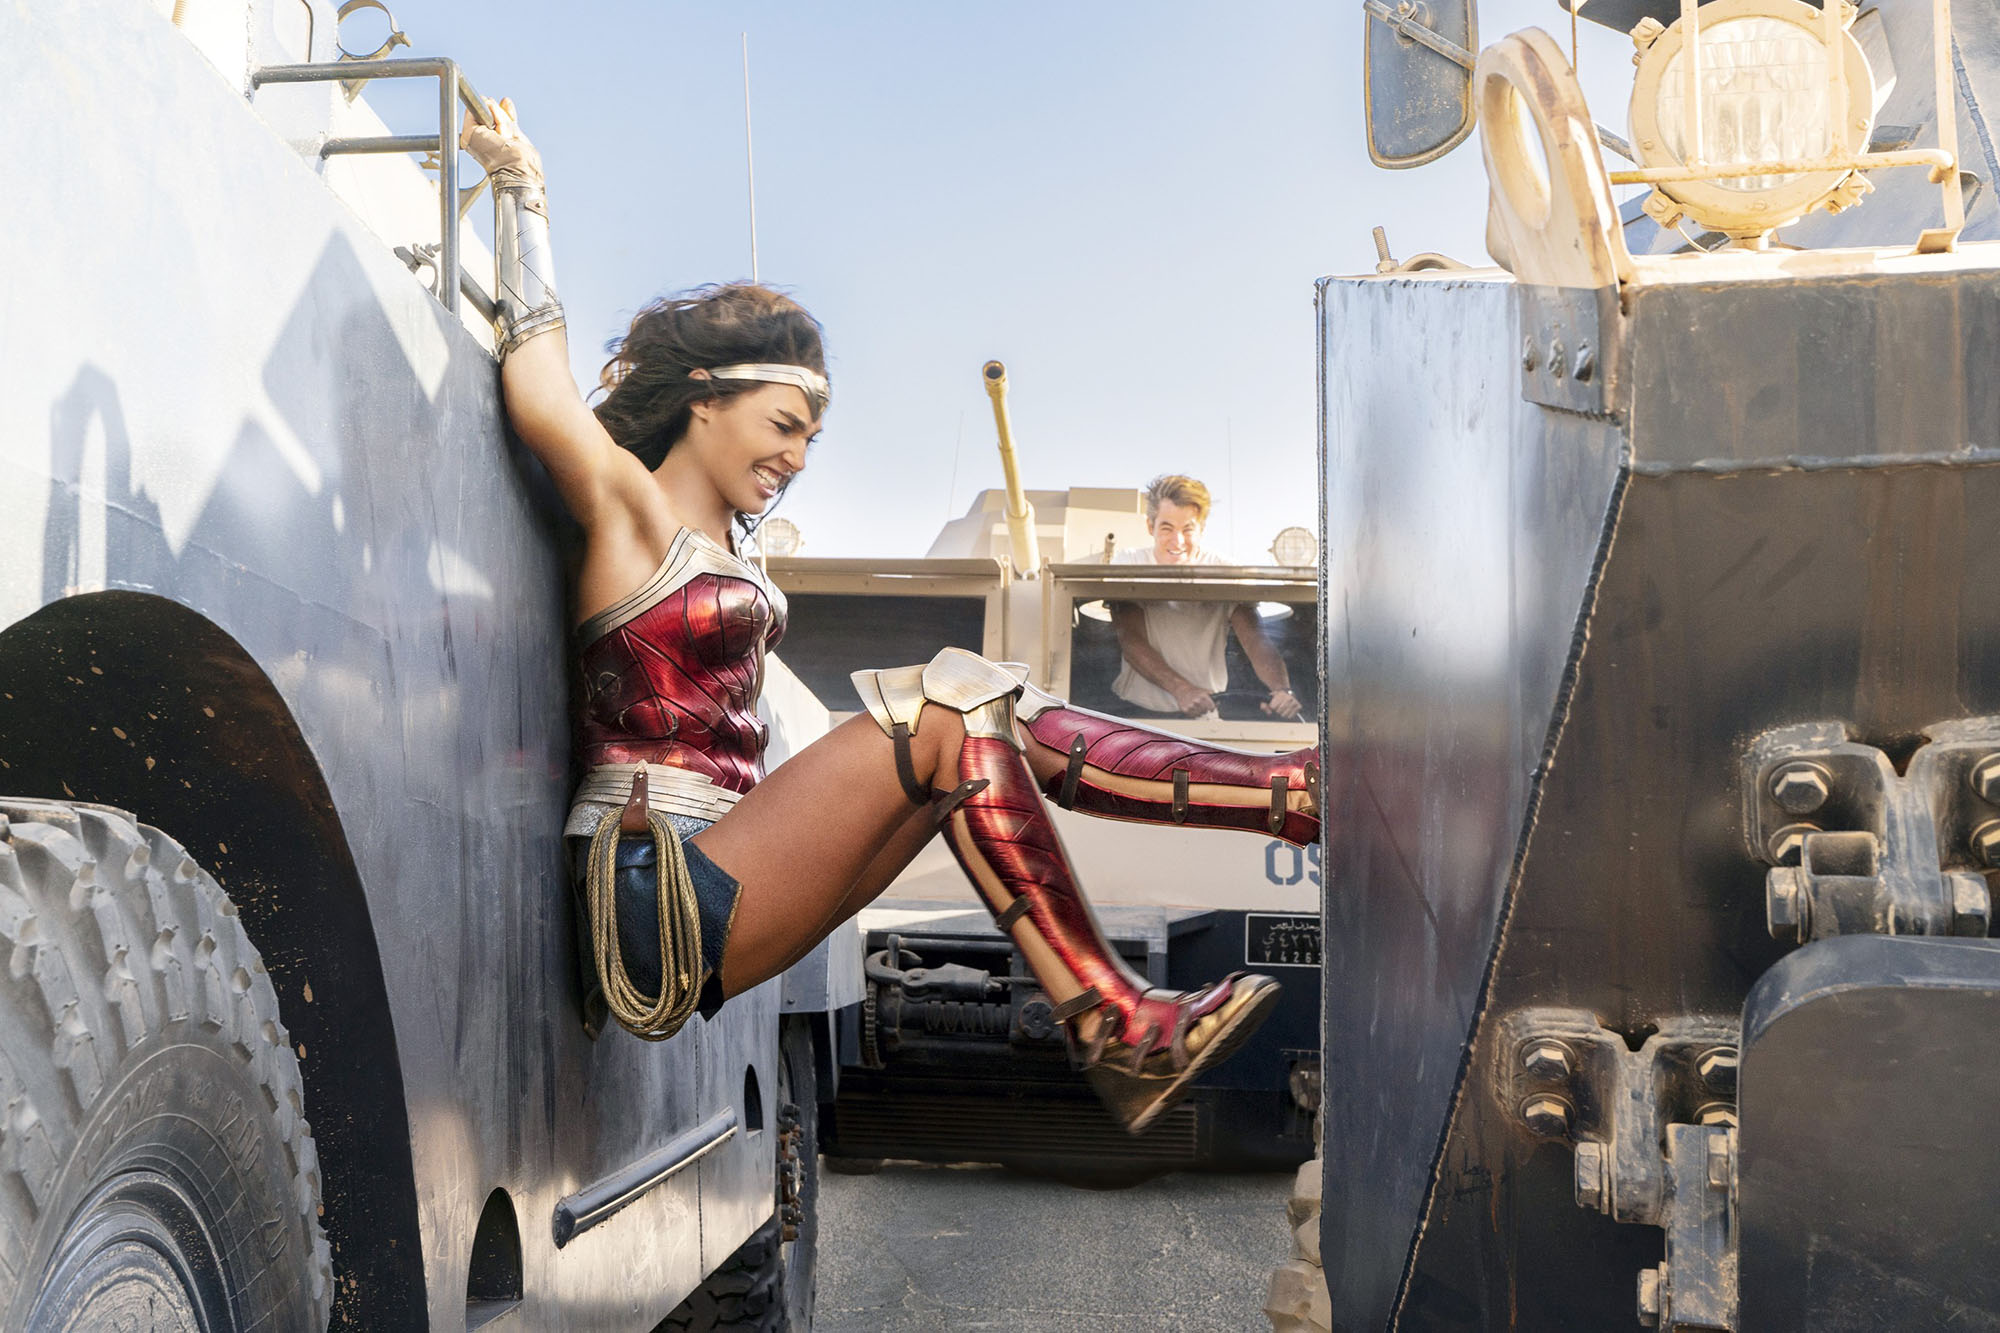 Wonder Woman 1984 smashes COVID-19 box office record